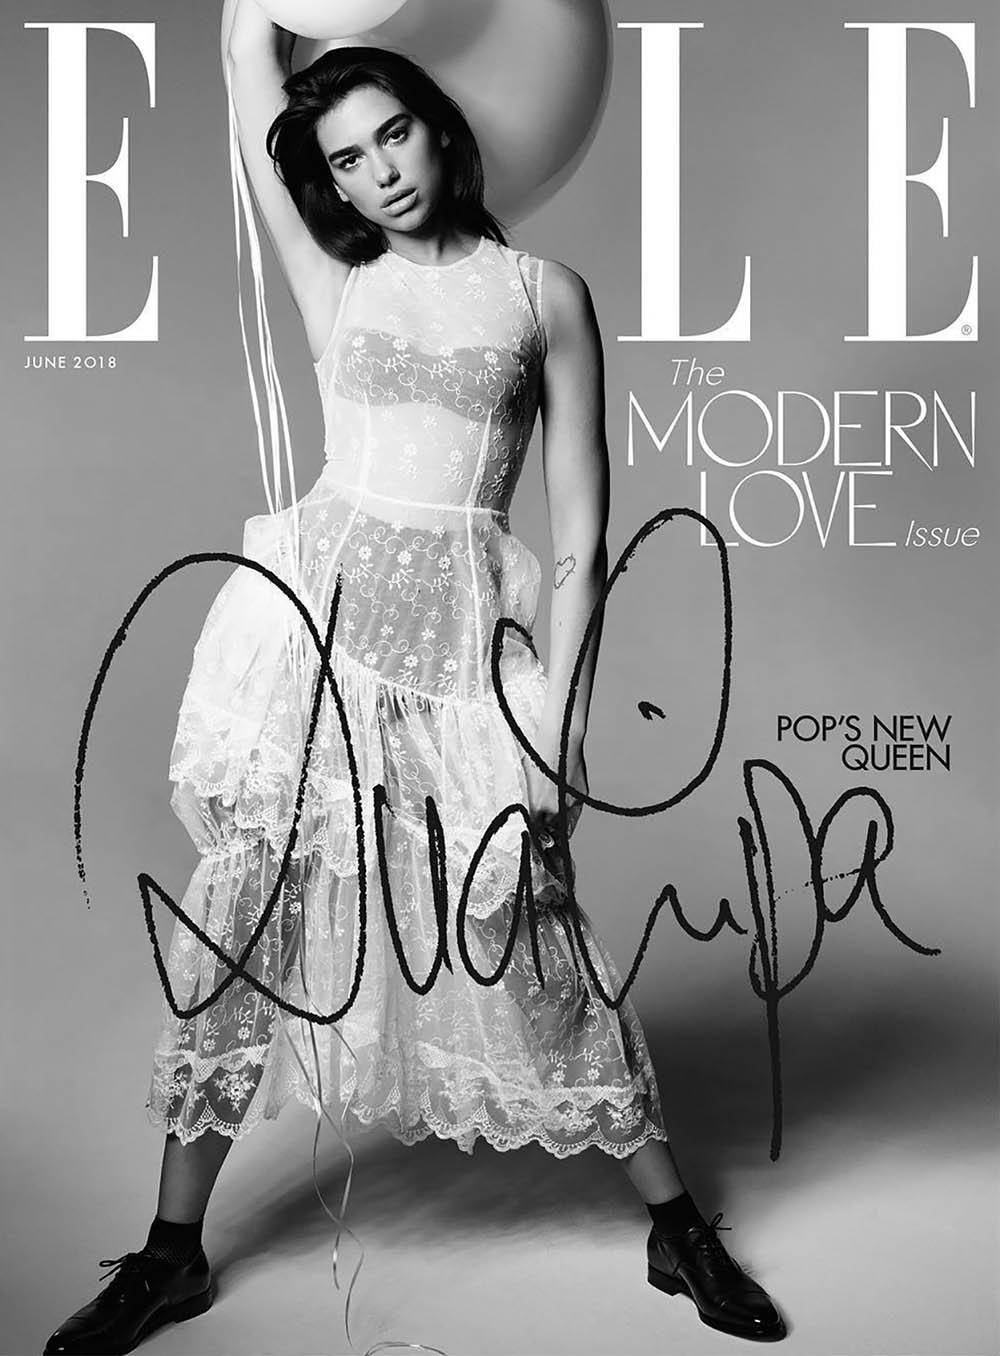 Dua Lipa covers Elle UK June 2018 by Liz Collins